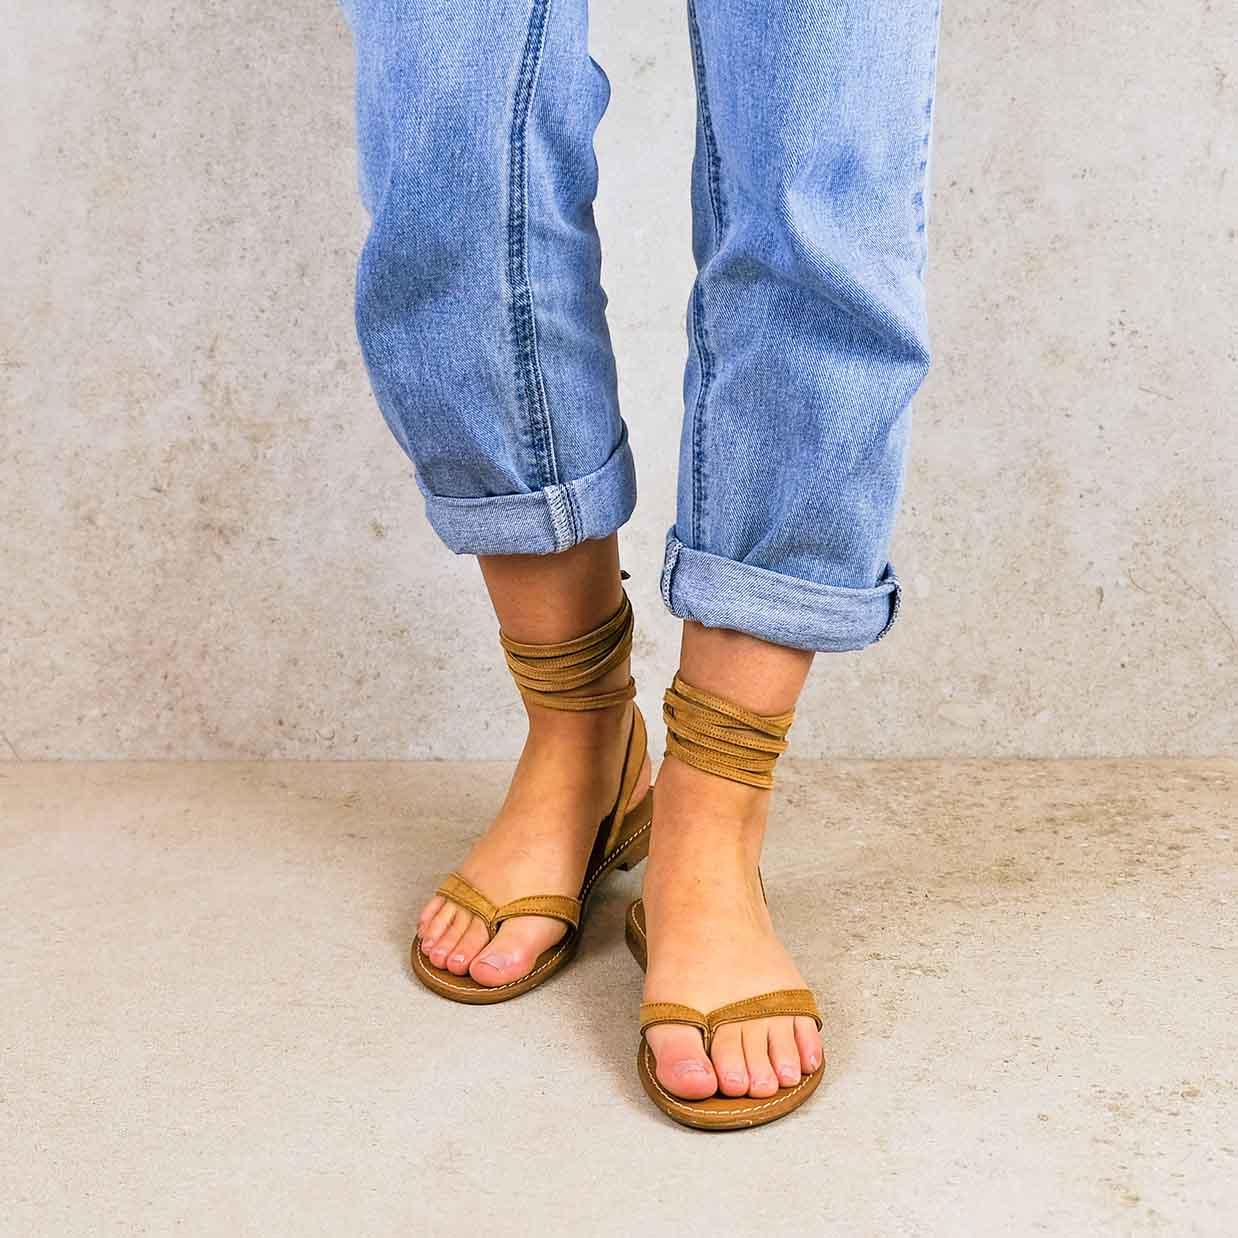 Sierra-camel_lintsandalen sandals travelsandals vegan sustainable sandals wikkelsandalen